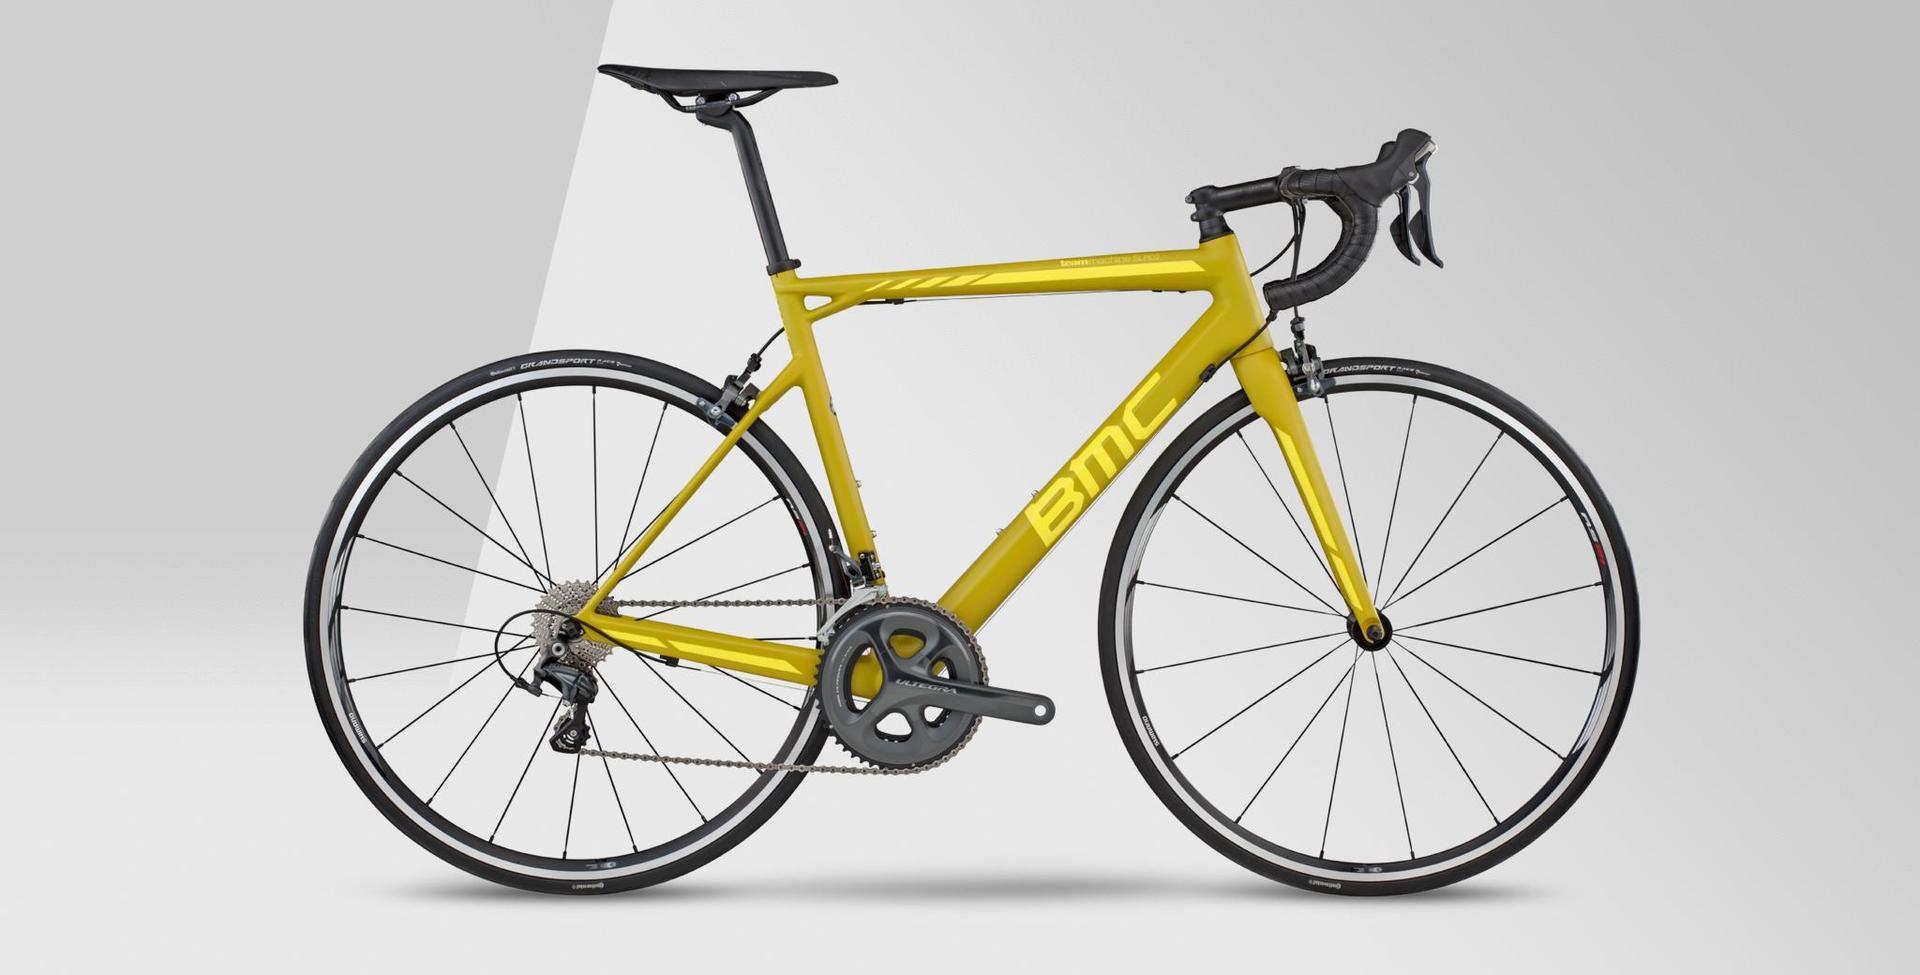 bicicletta da strada con telaio giallo